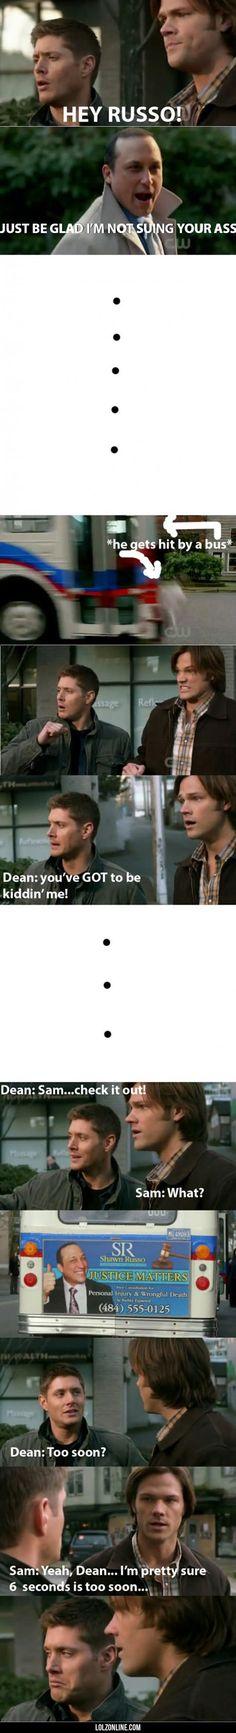 Dean that was too soon